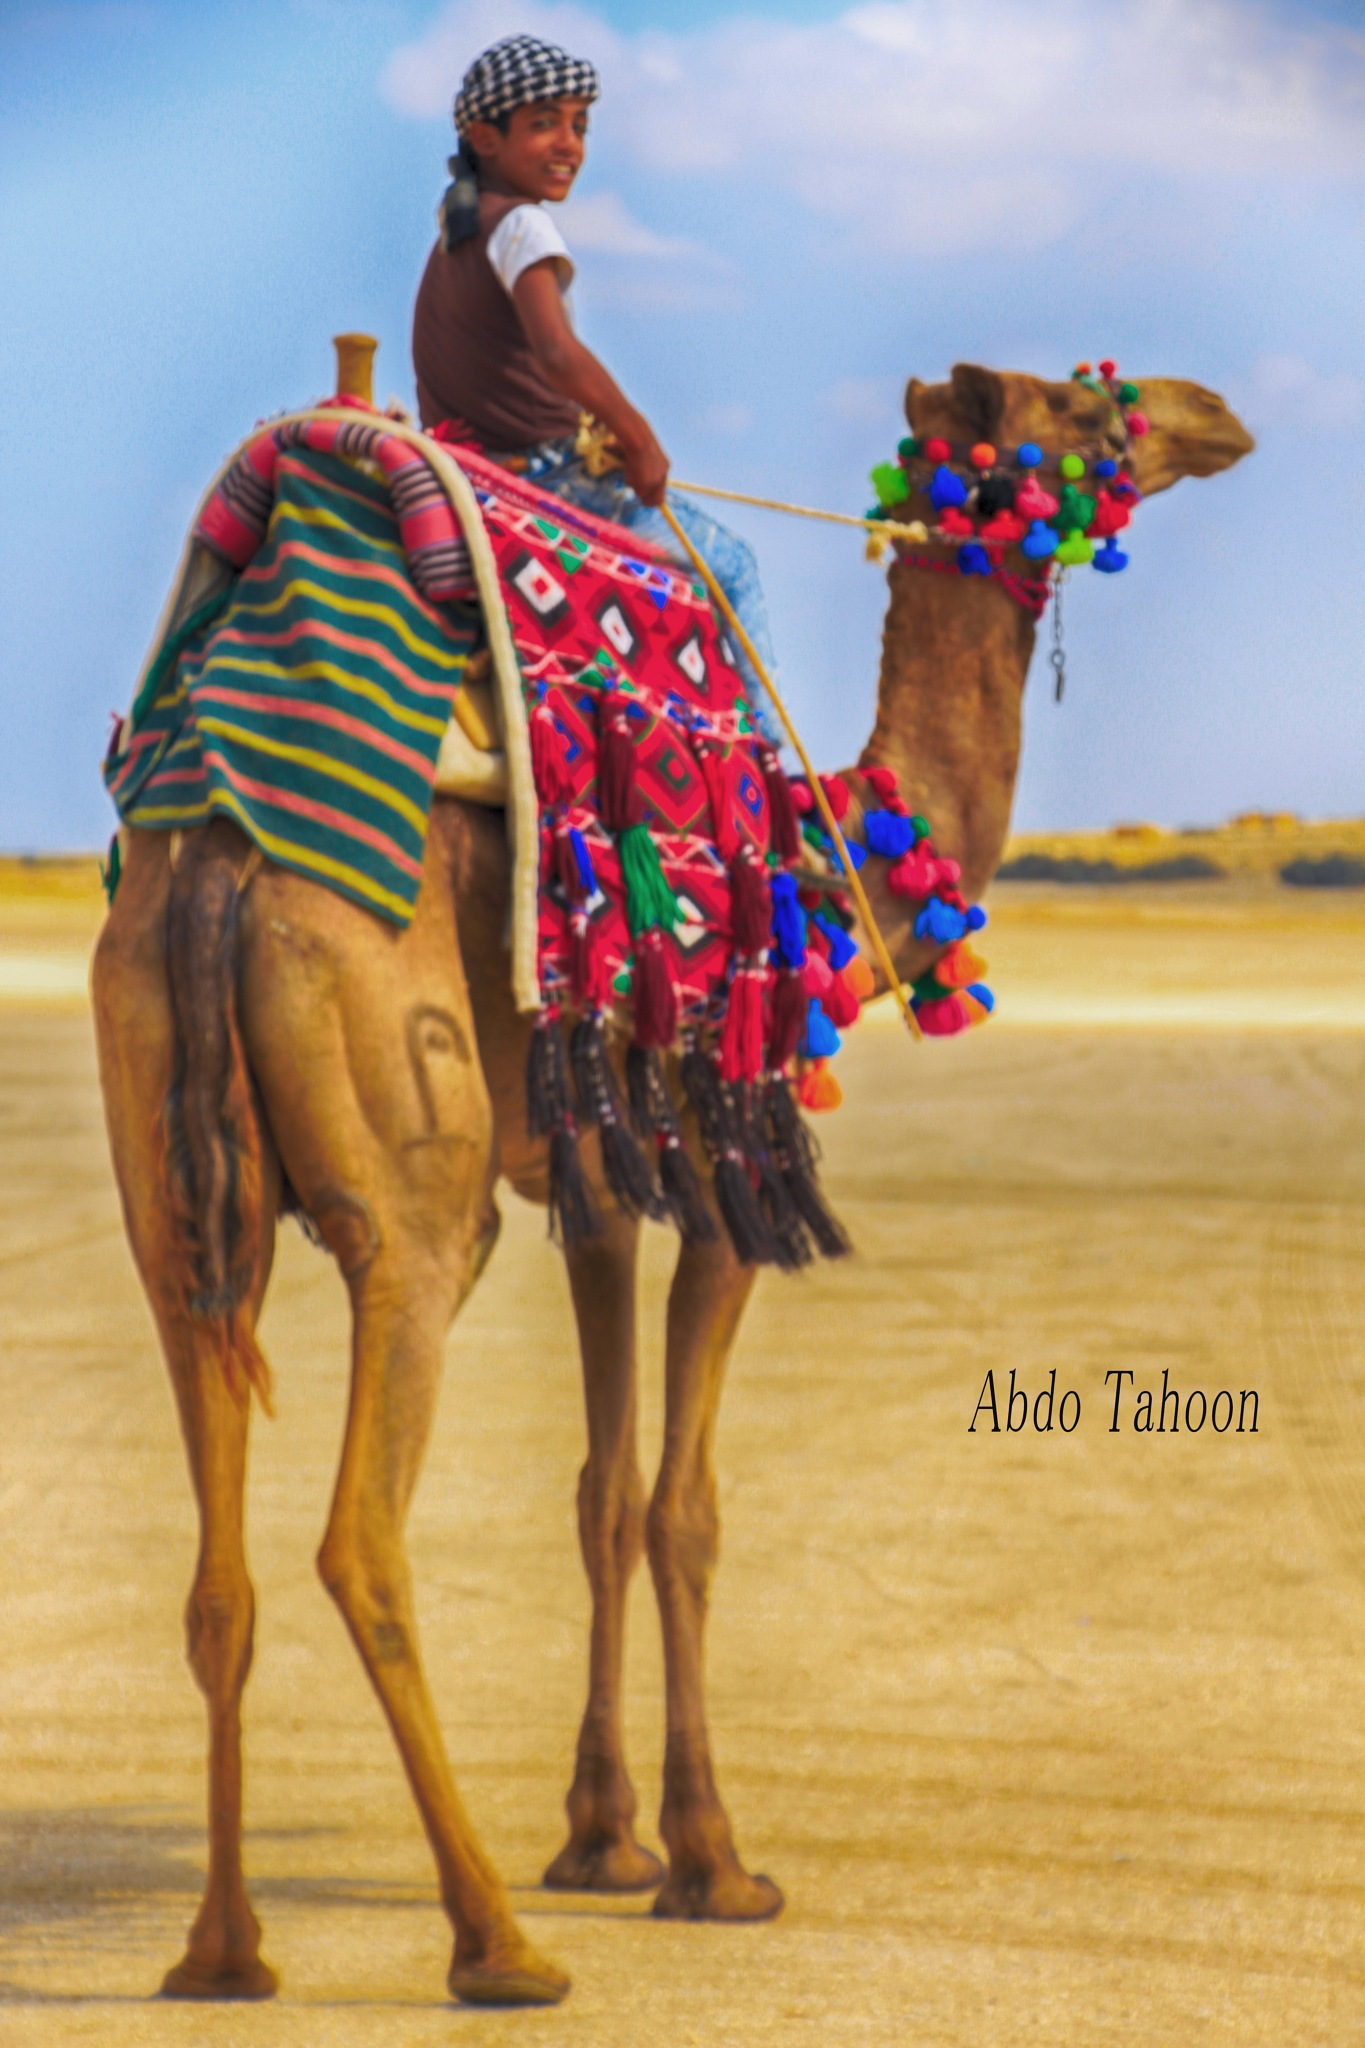 Camel by Abdo Tahoon